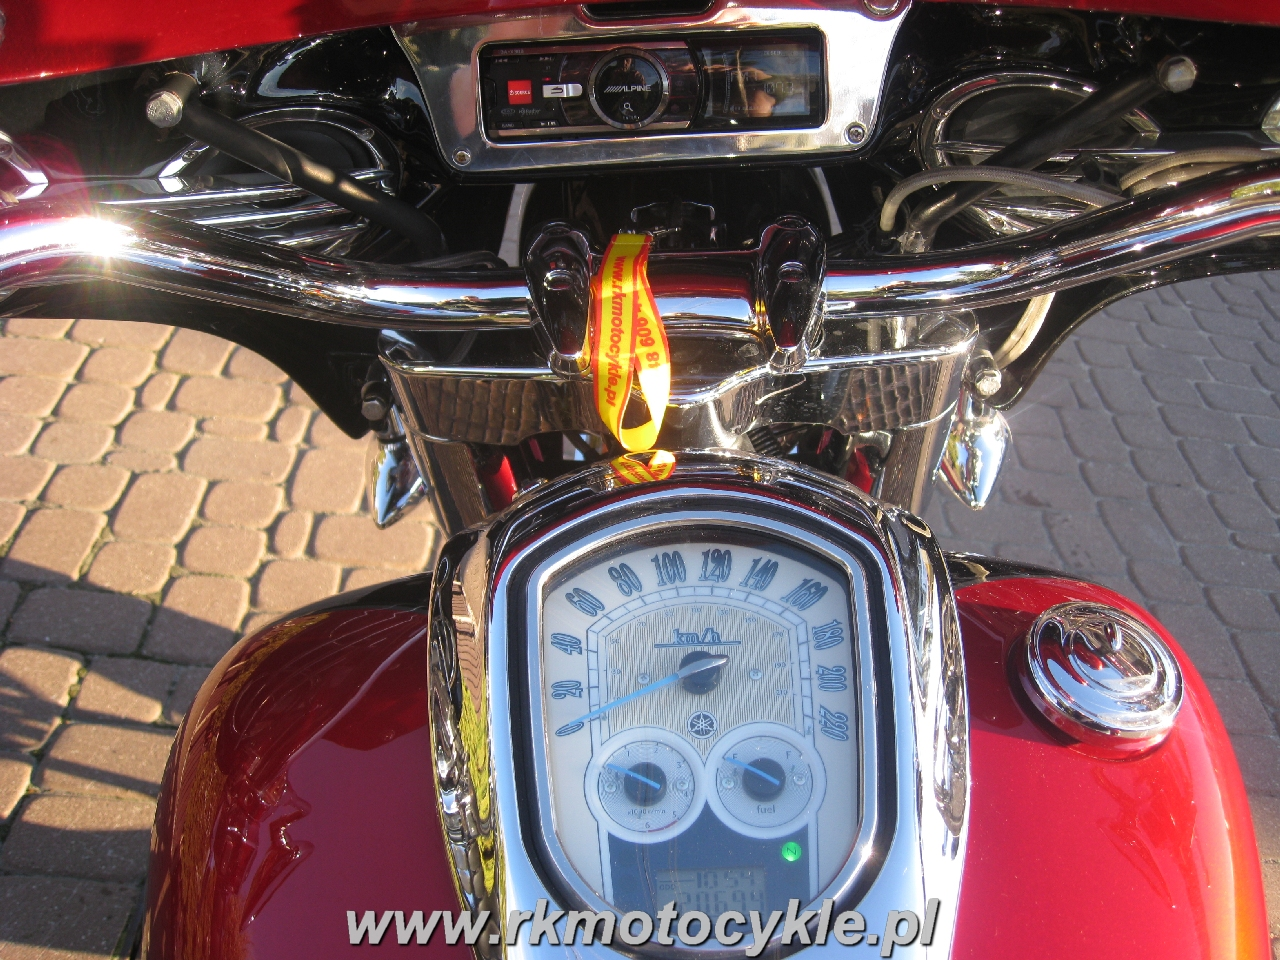 RK MOTOCYKLE YAMAHA XV1900 STRATOLINER ROADLINER XV 1900